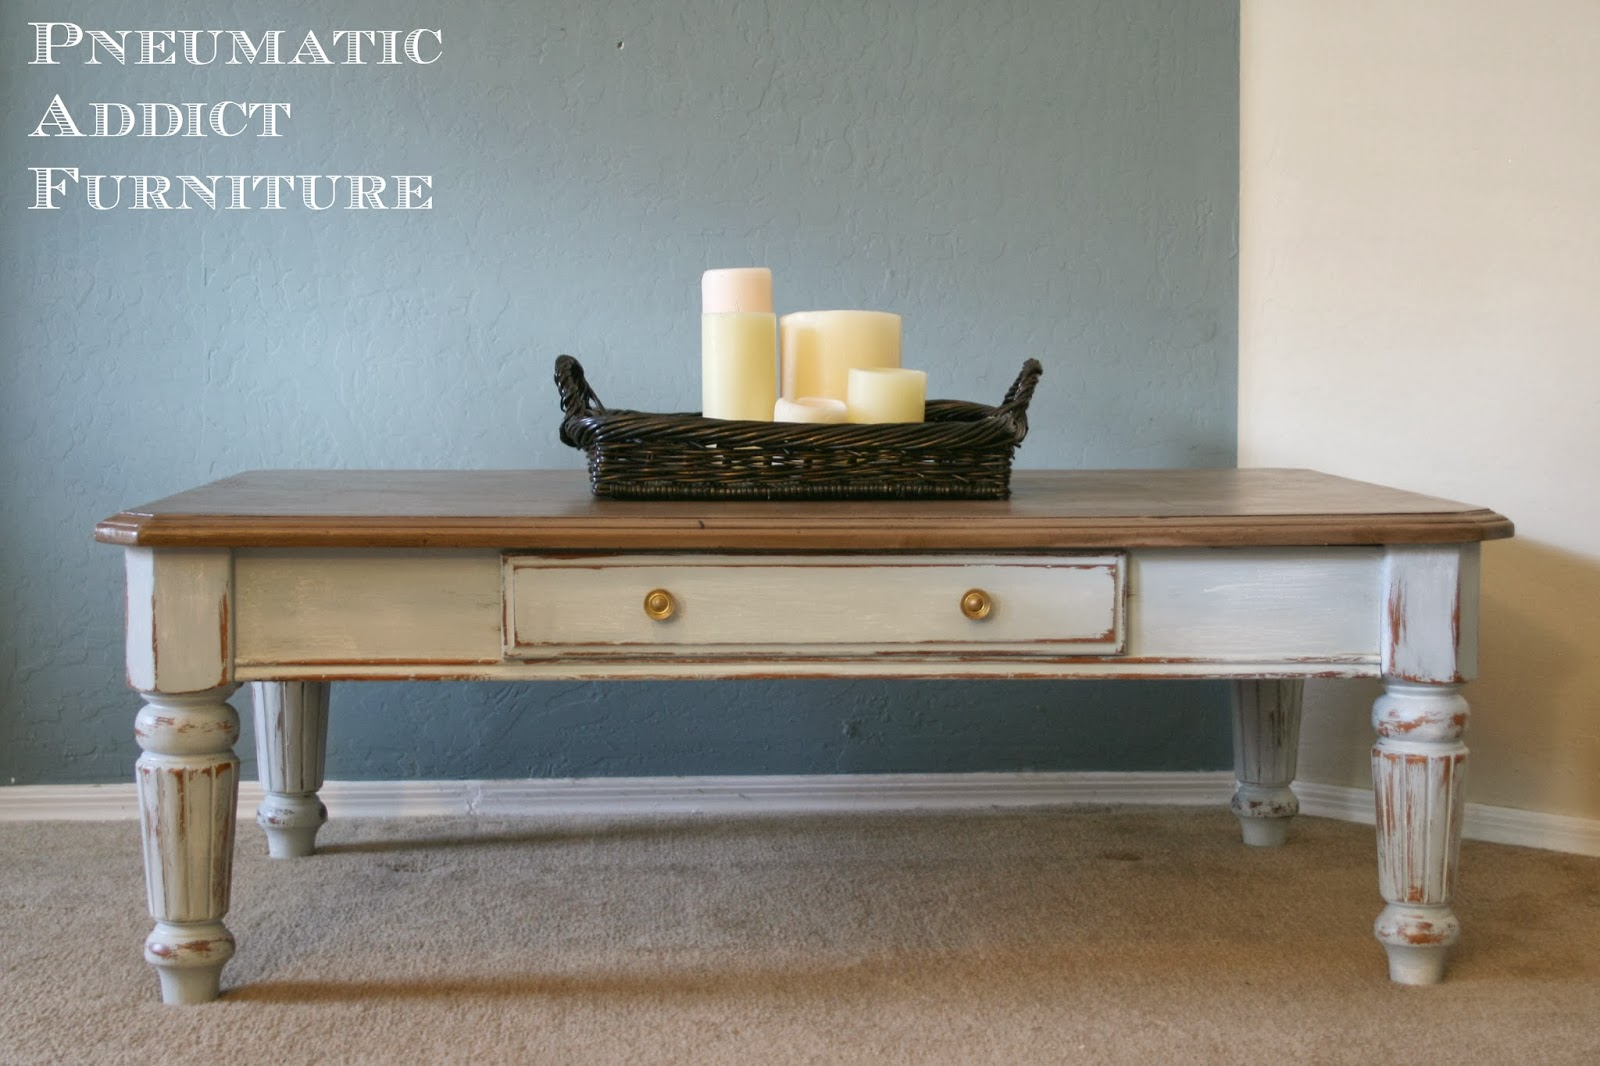 particle wood furniture. Particle Wood Furniture